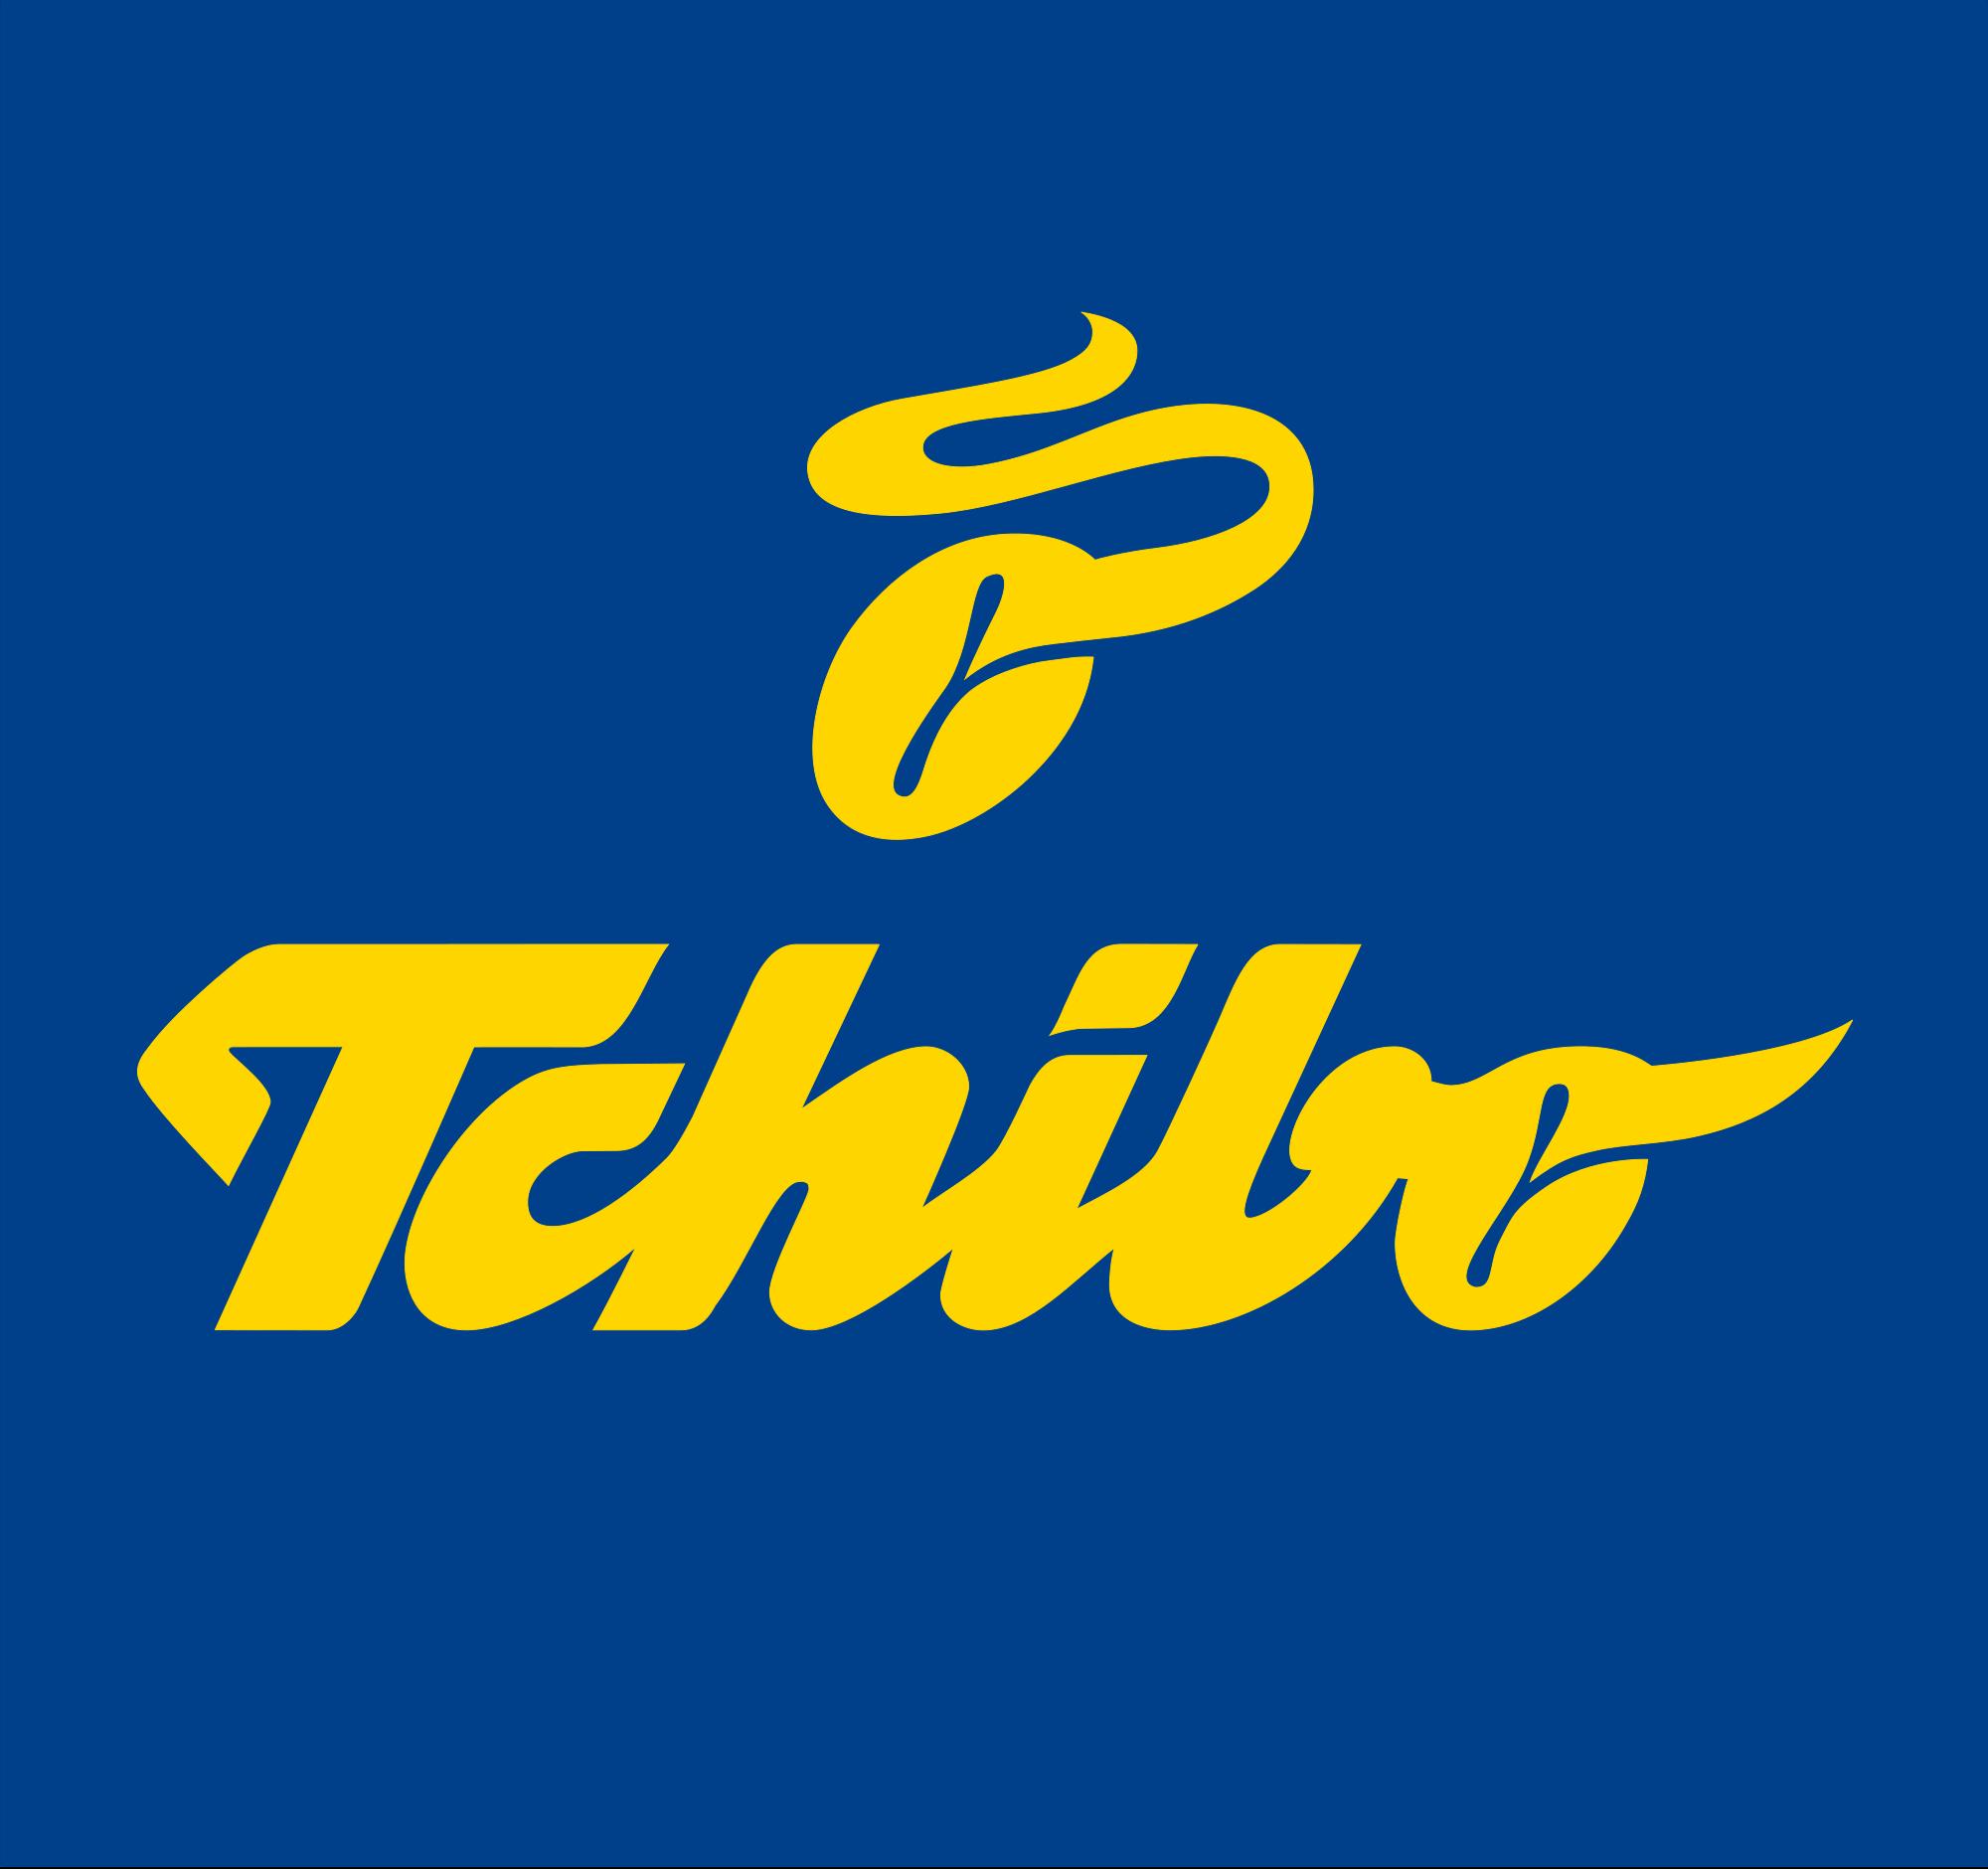 Tchibo